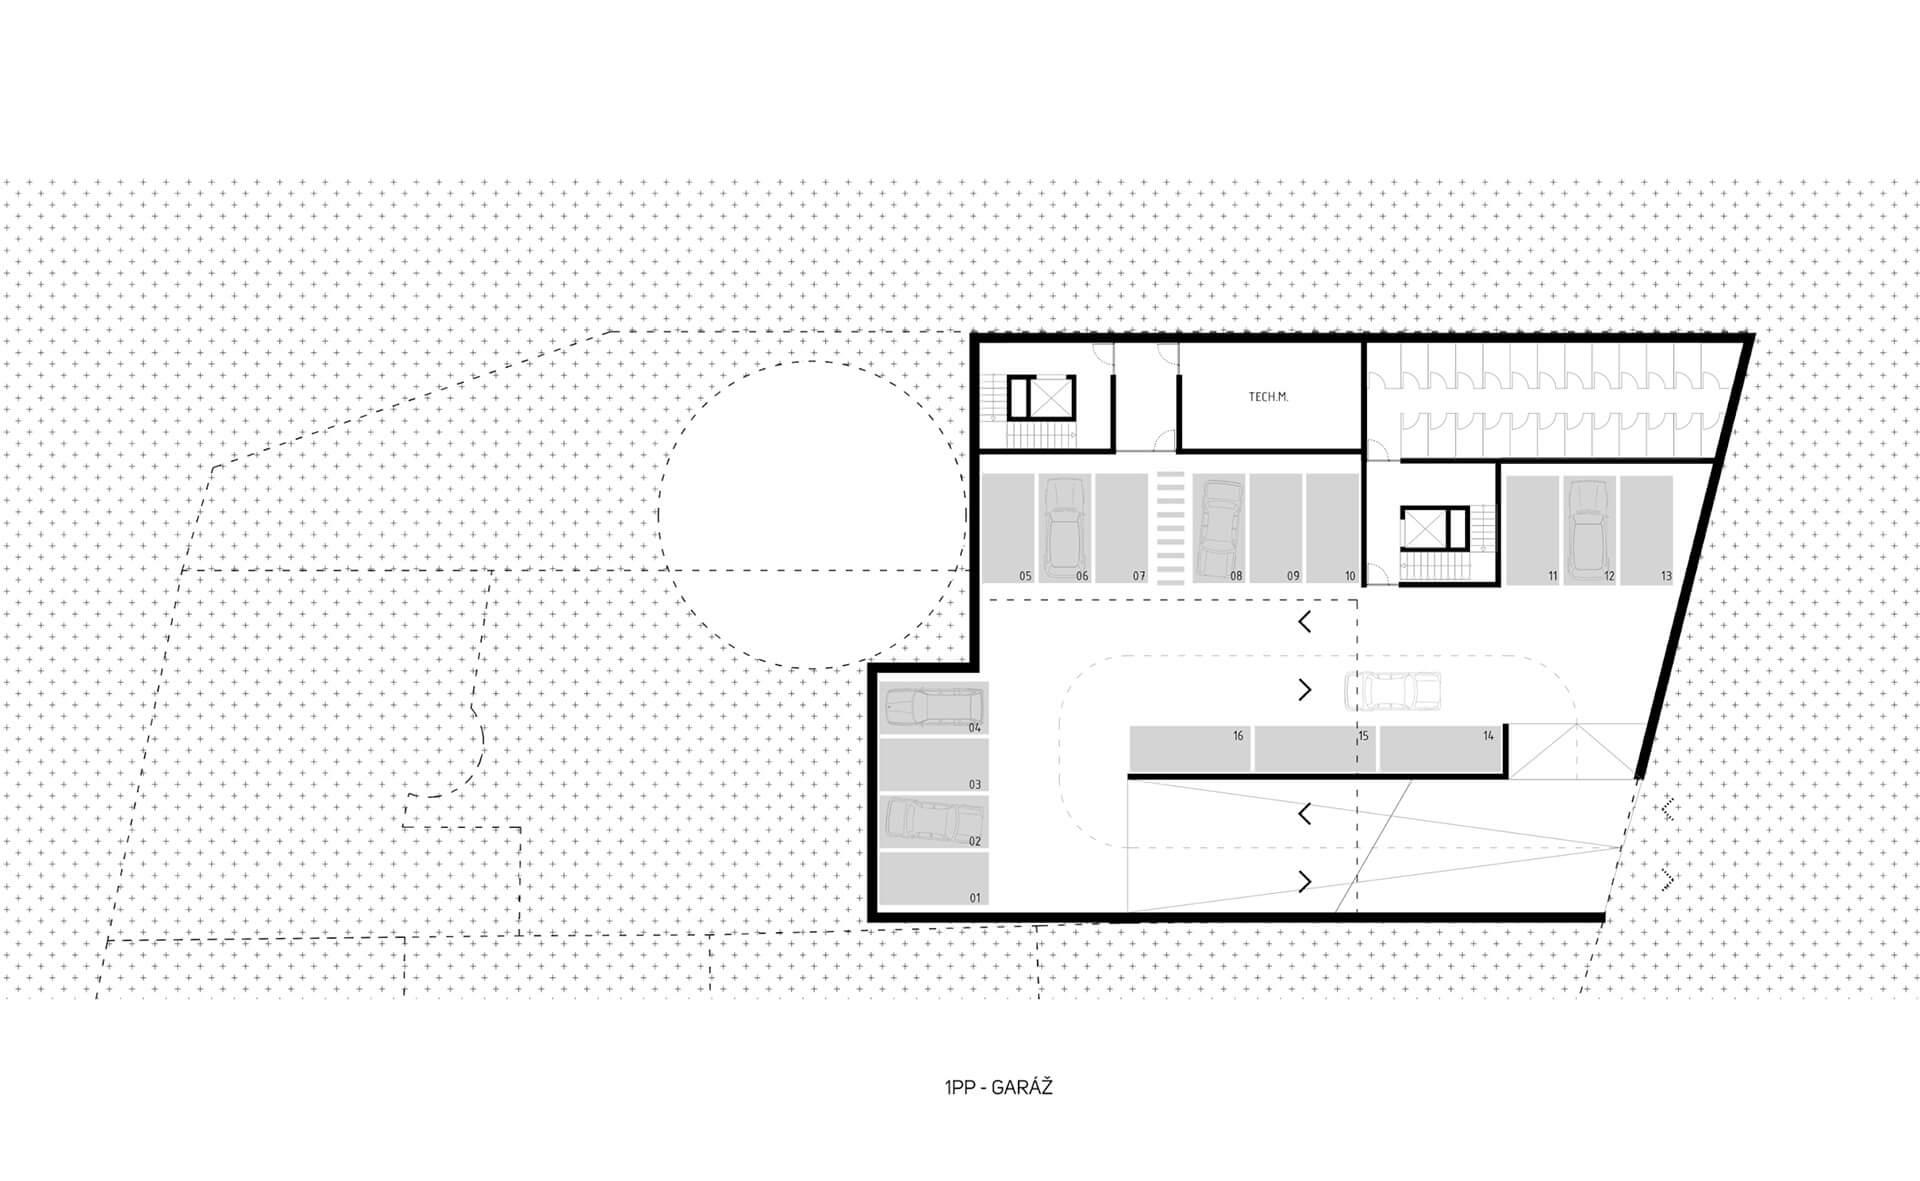 sutaz-bytovy-dom-ostrava_schema_gif_2